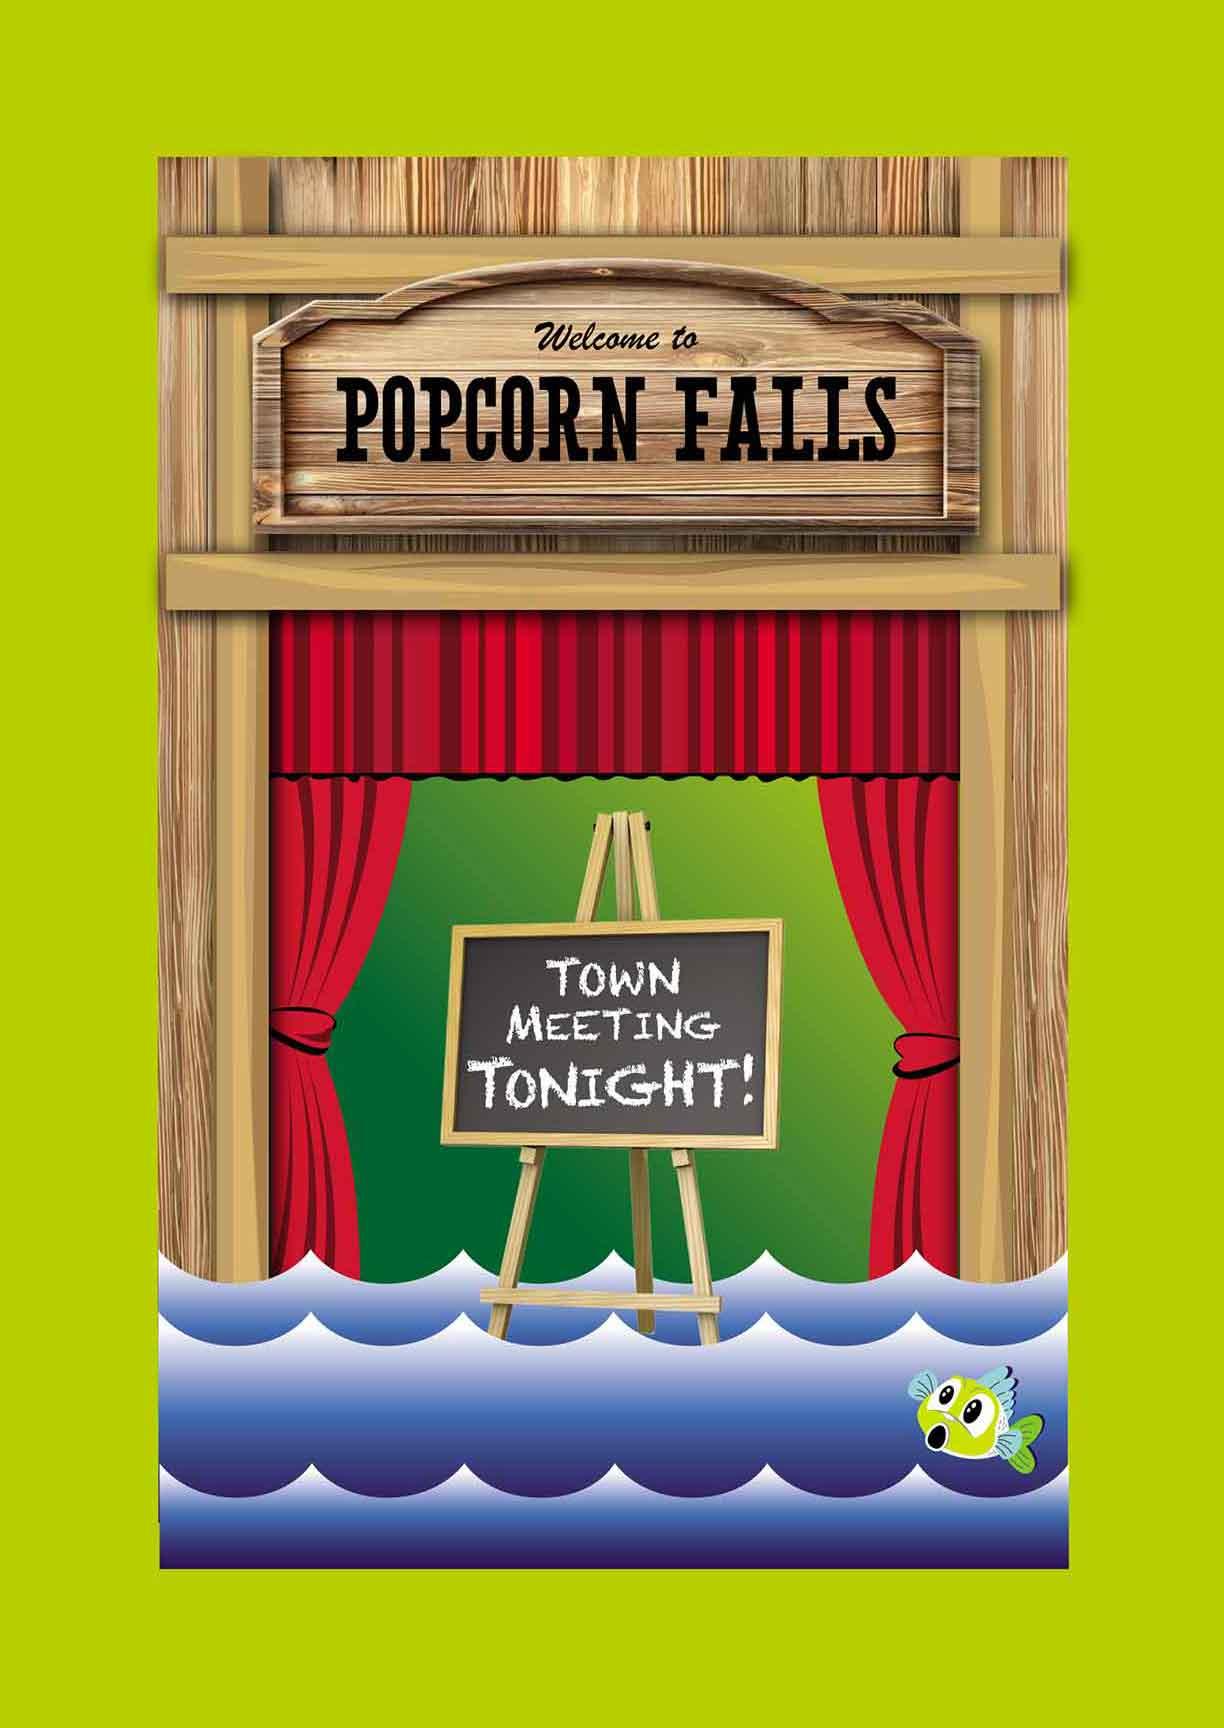 popcorn_falls_image_2